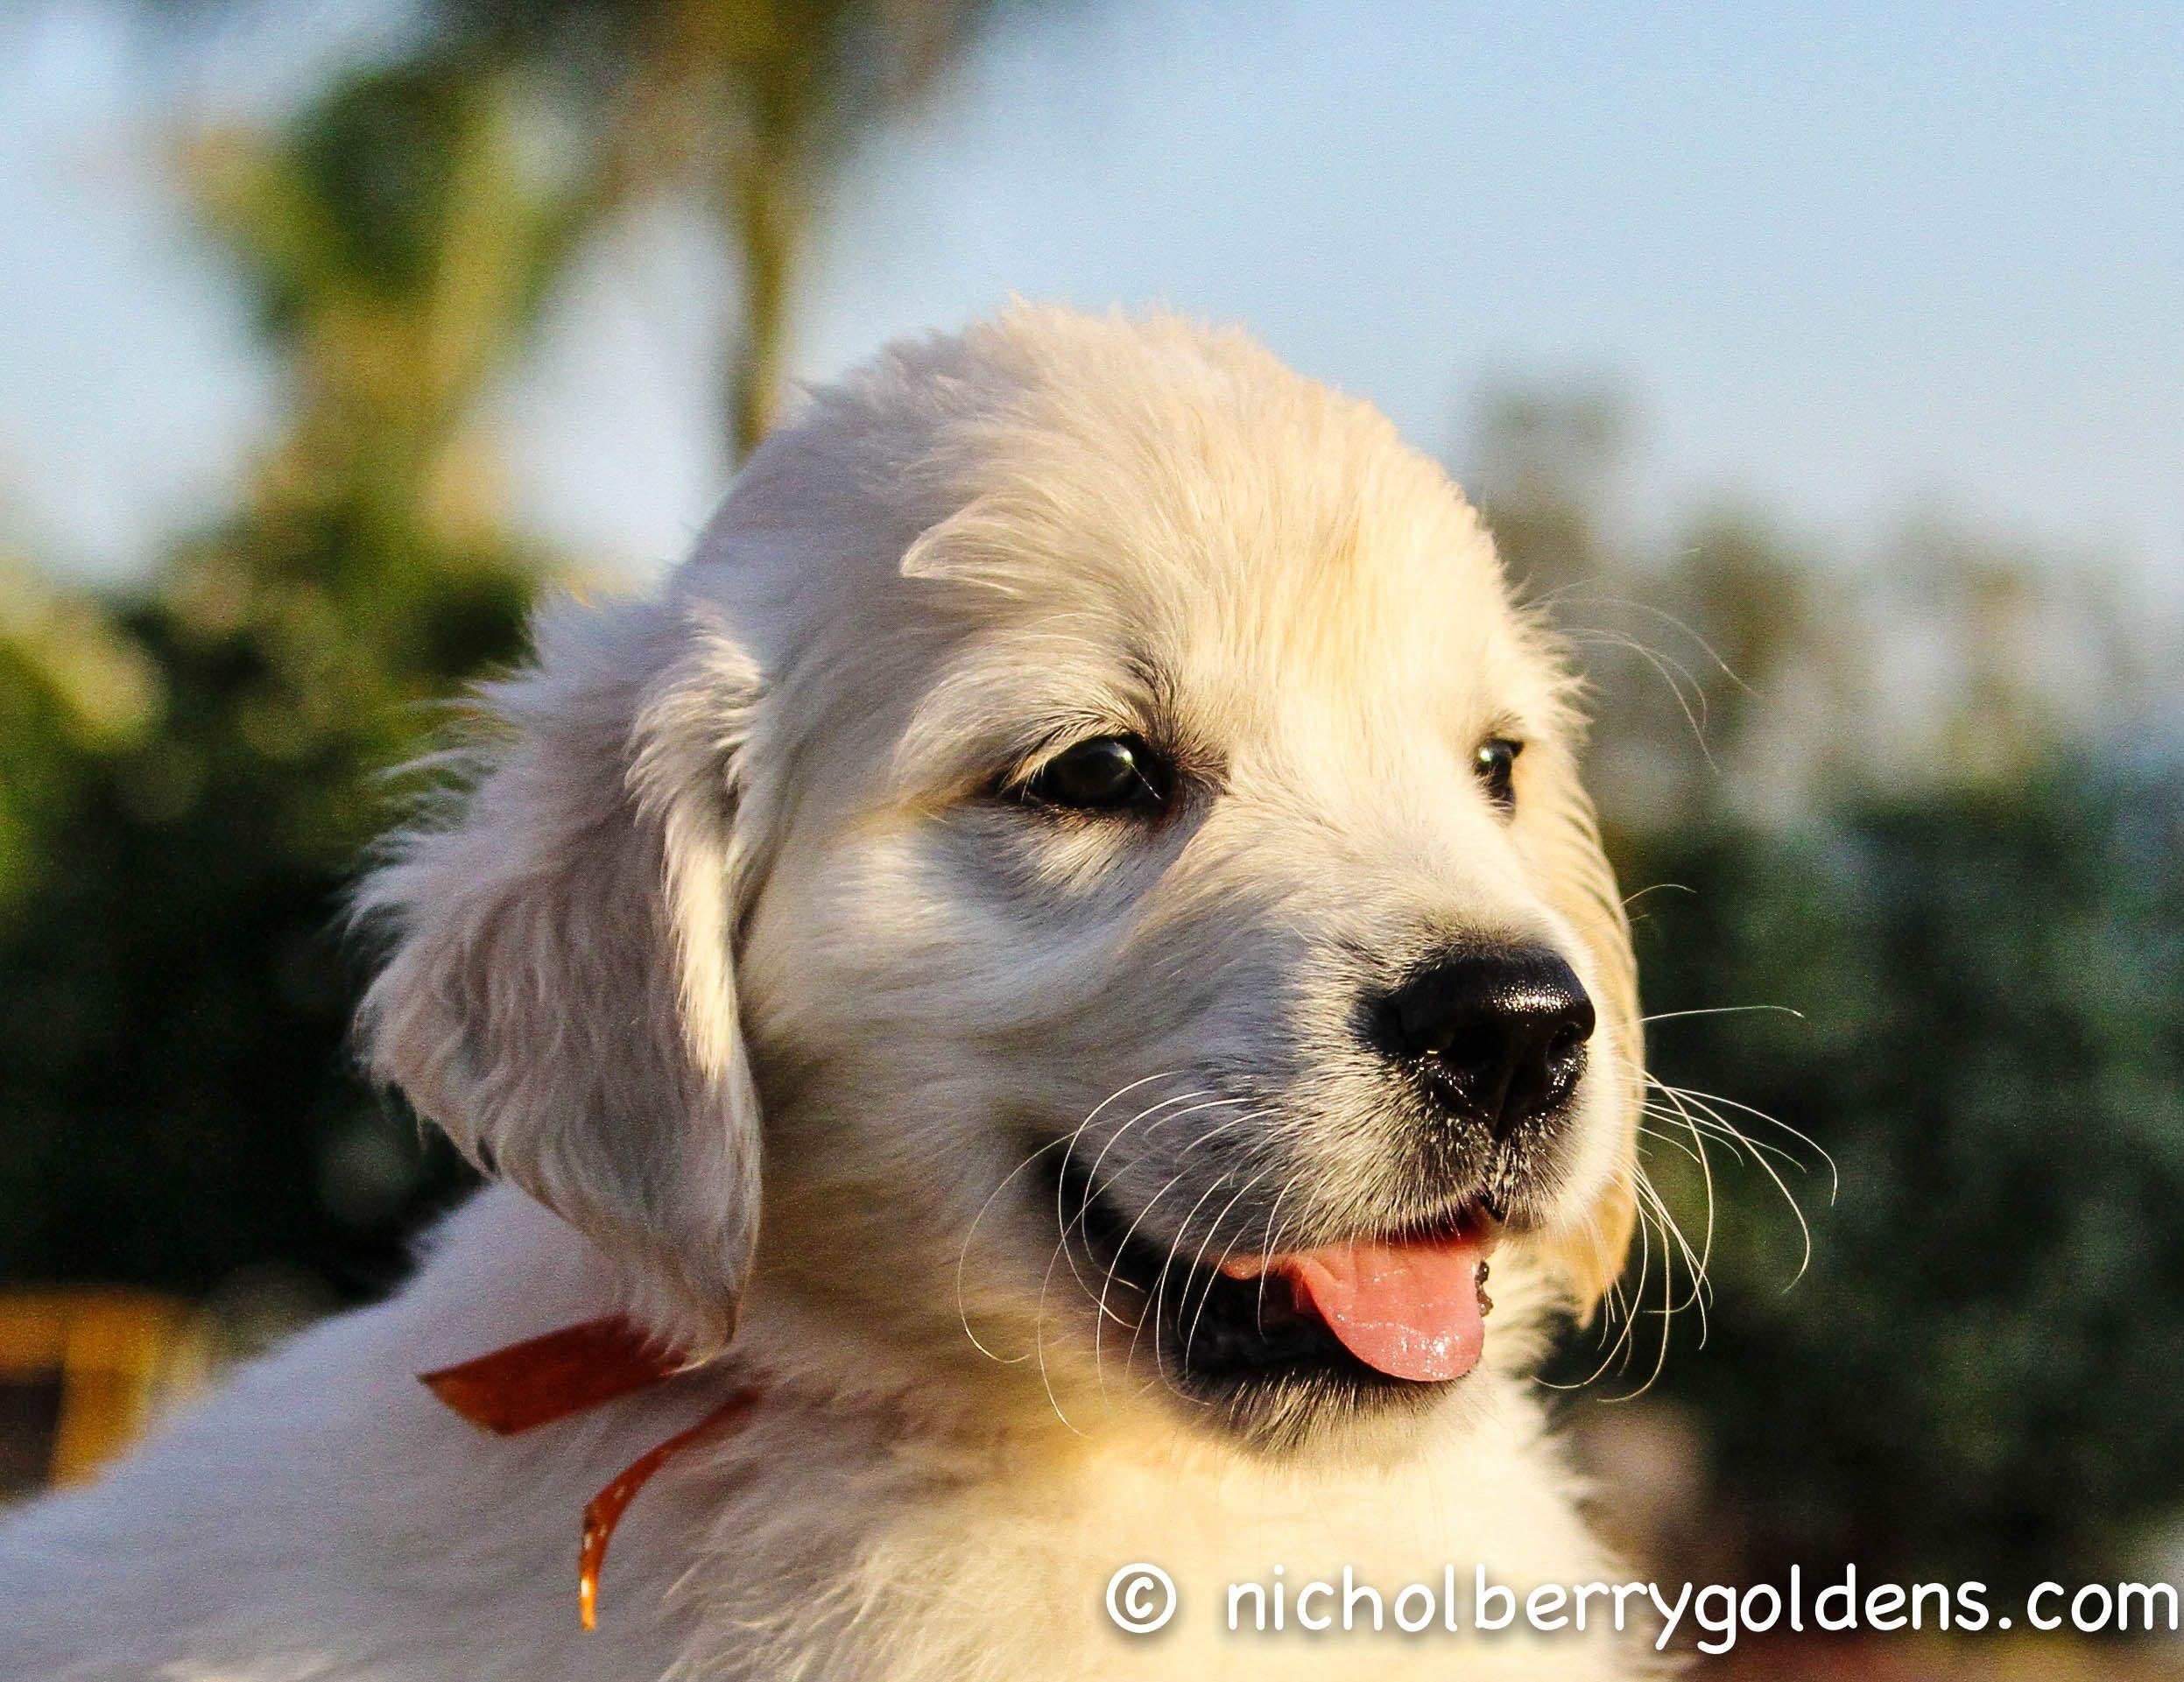 Www Nicholberrygoldens Com 7 Week Old English Golden Retriever Puppy English Golden Retriever Puppy Golden Retriever English Golden Retrievers